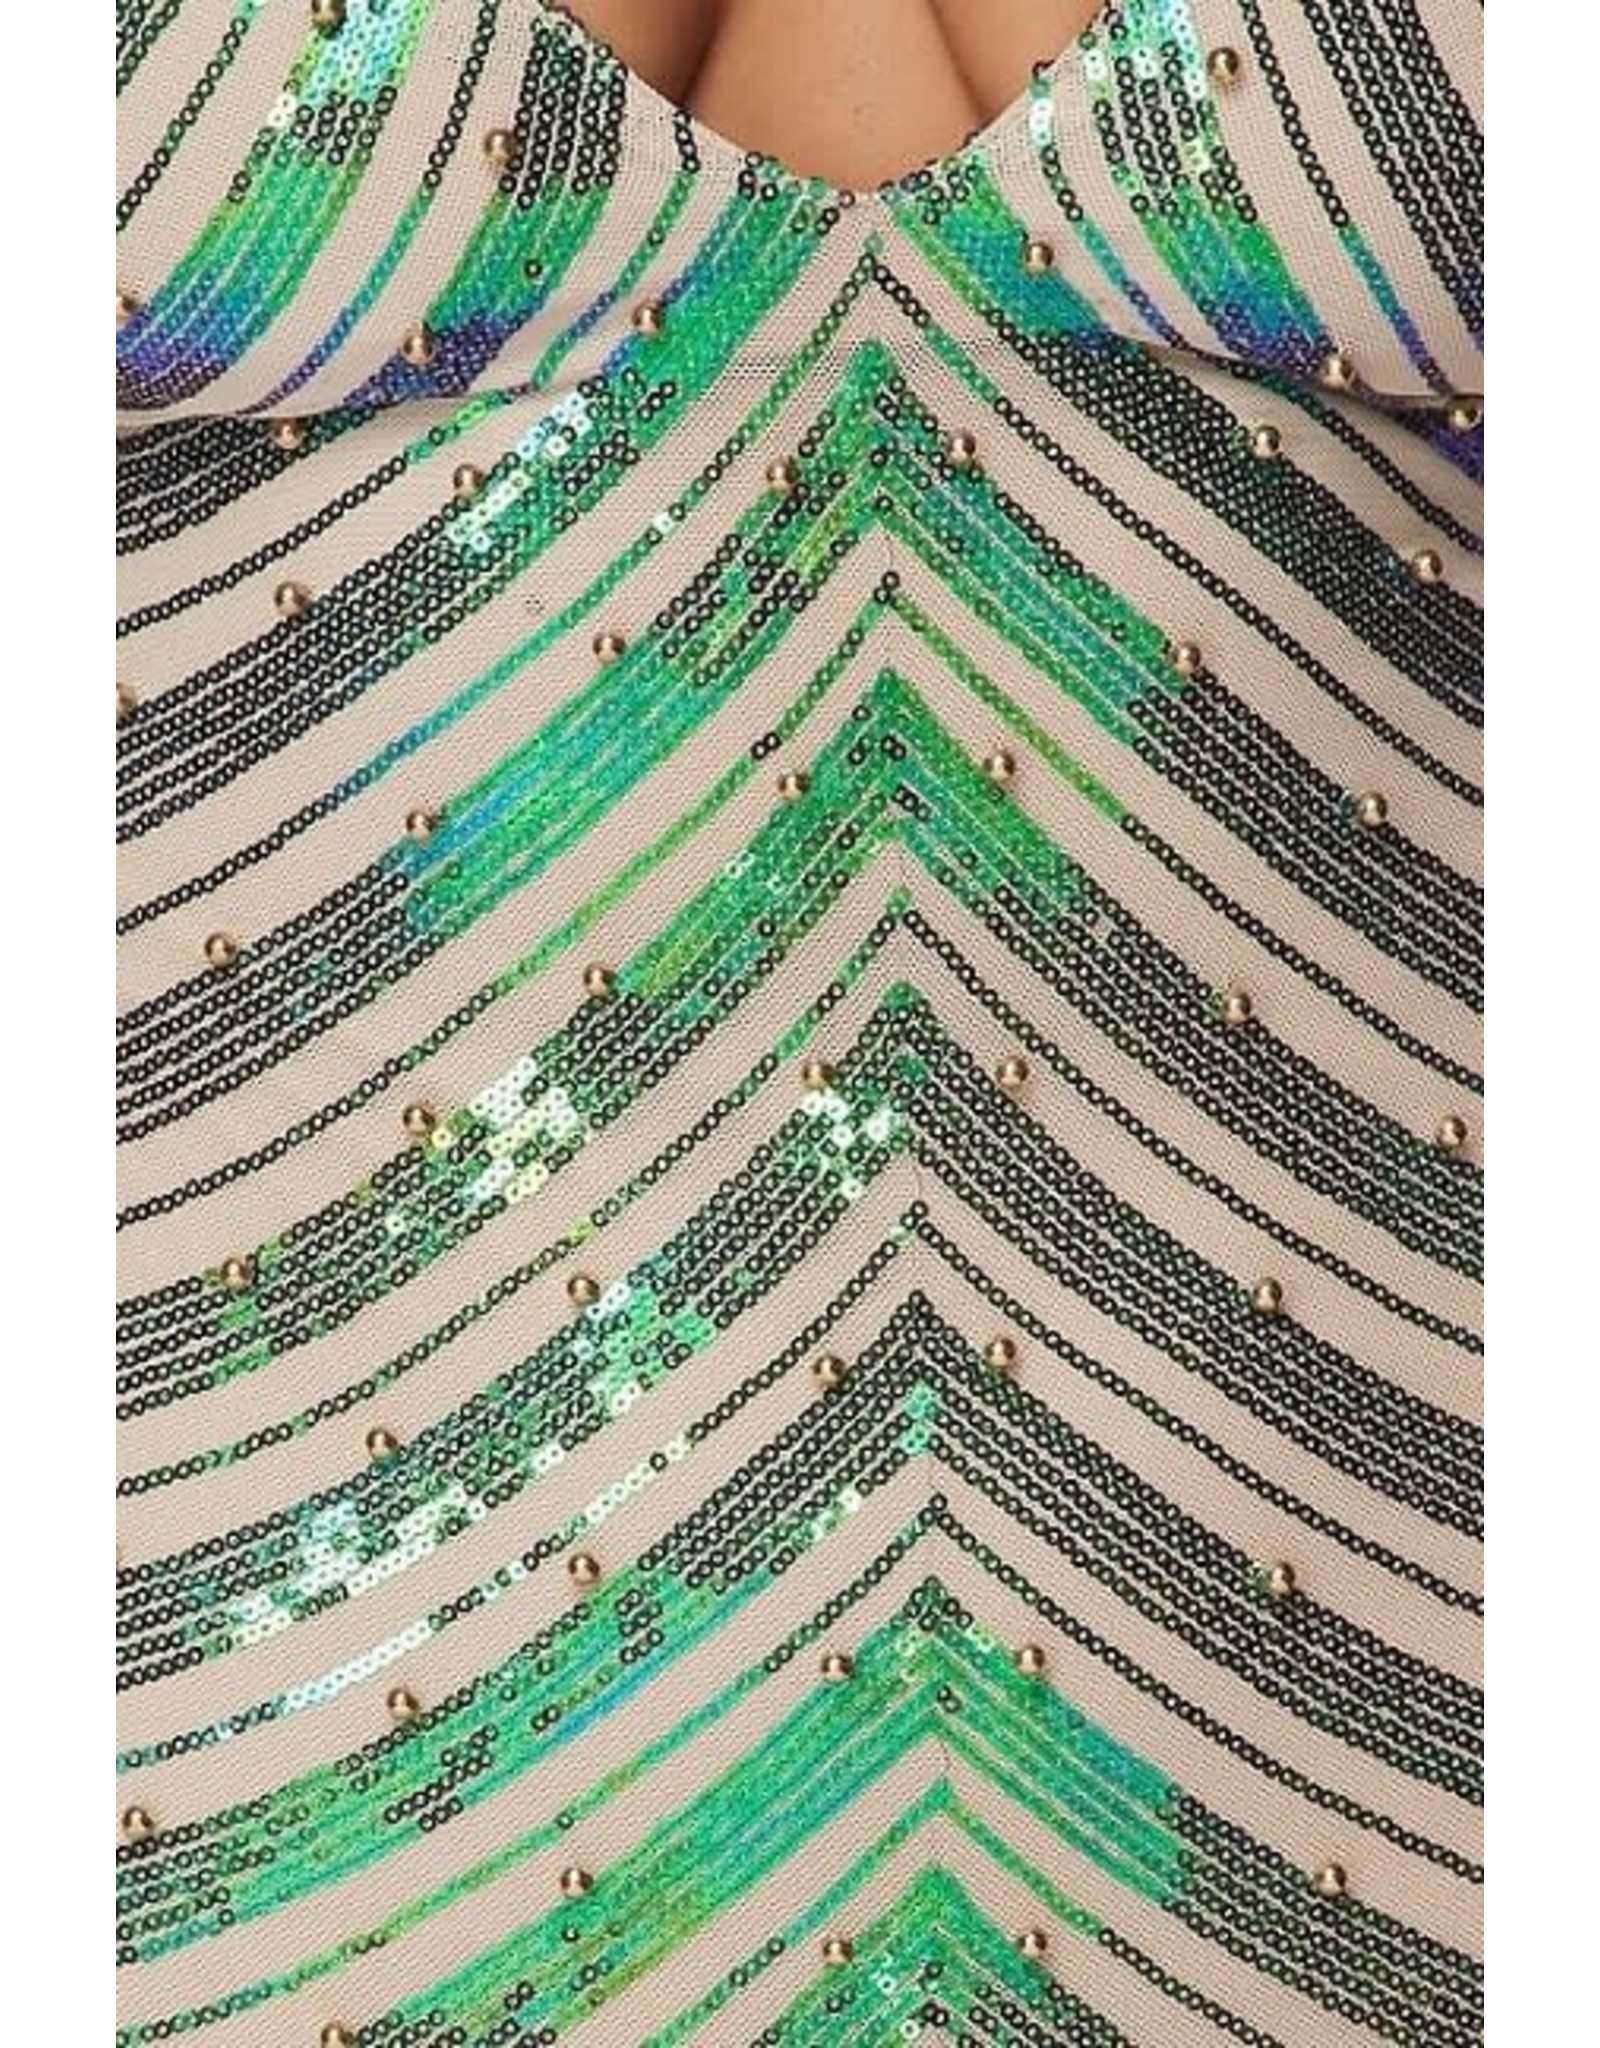 So Mesmerized Sequin Dress